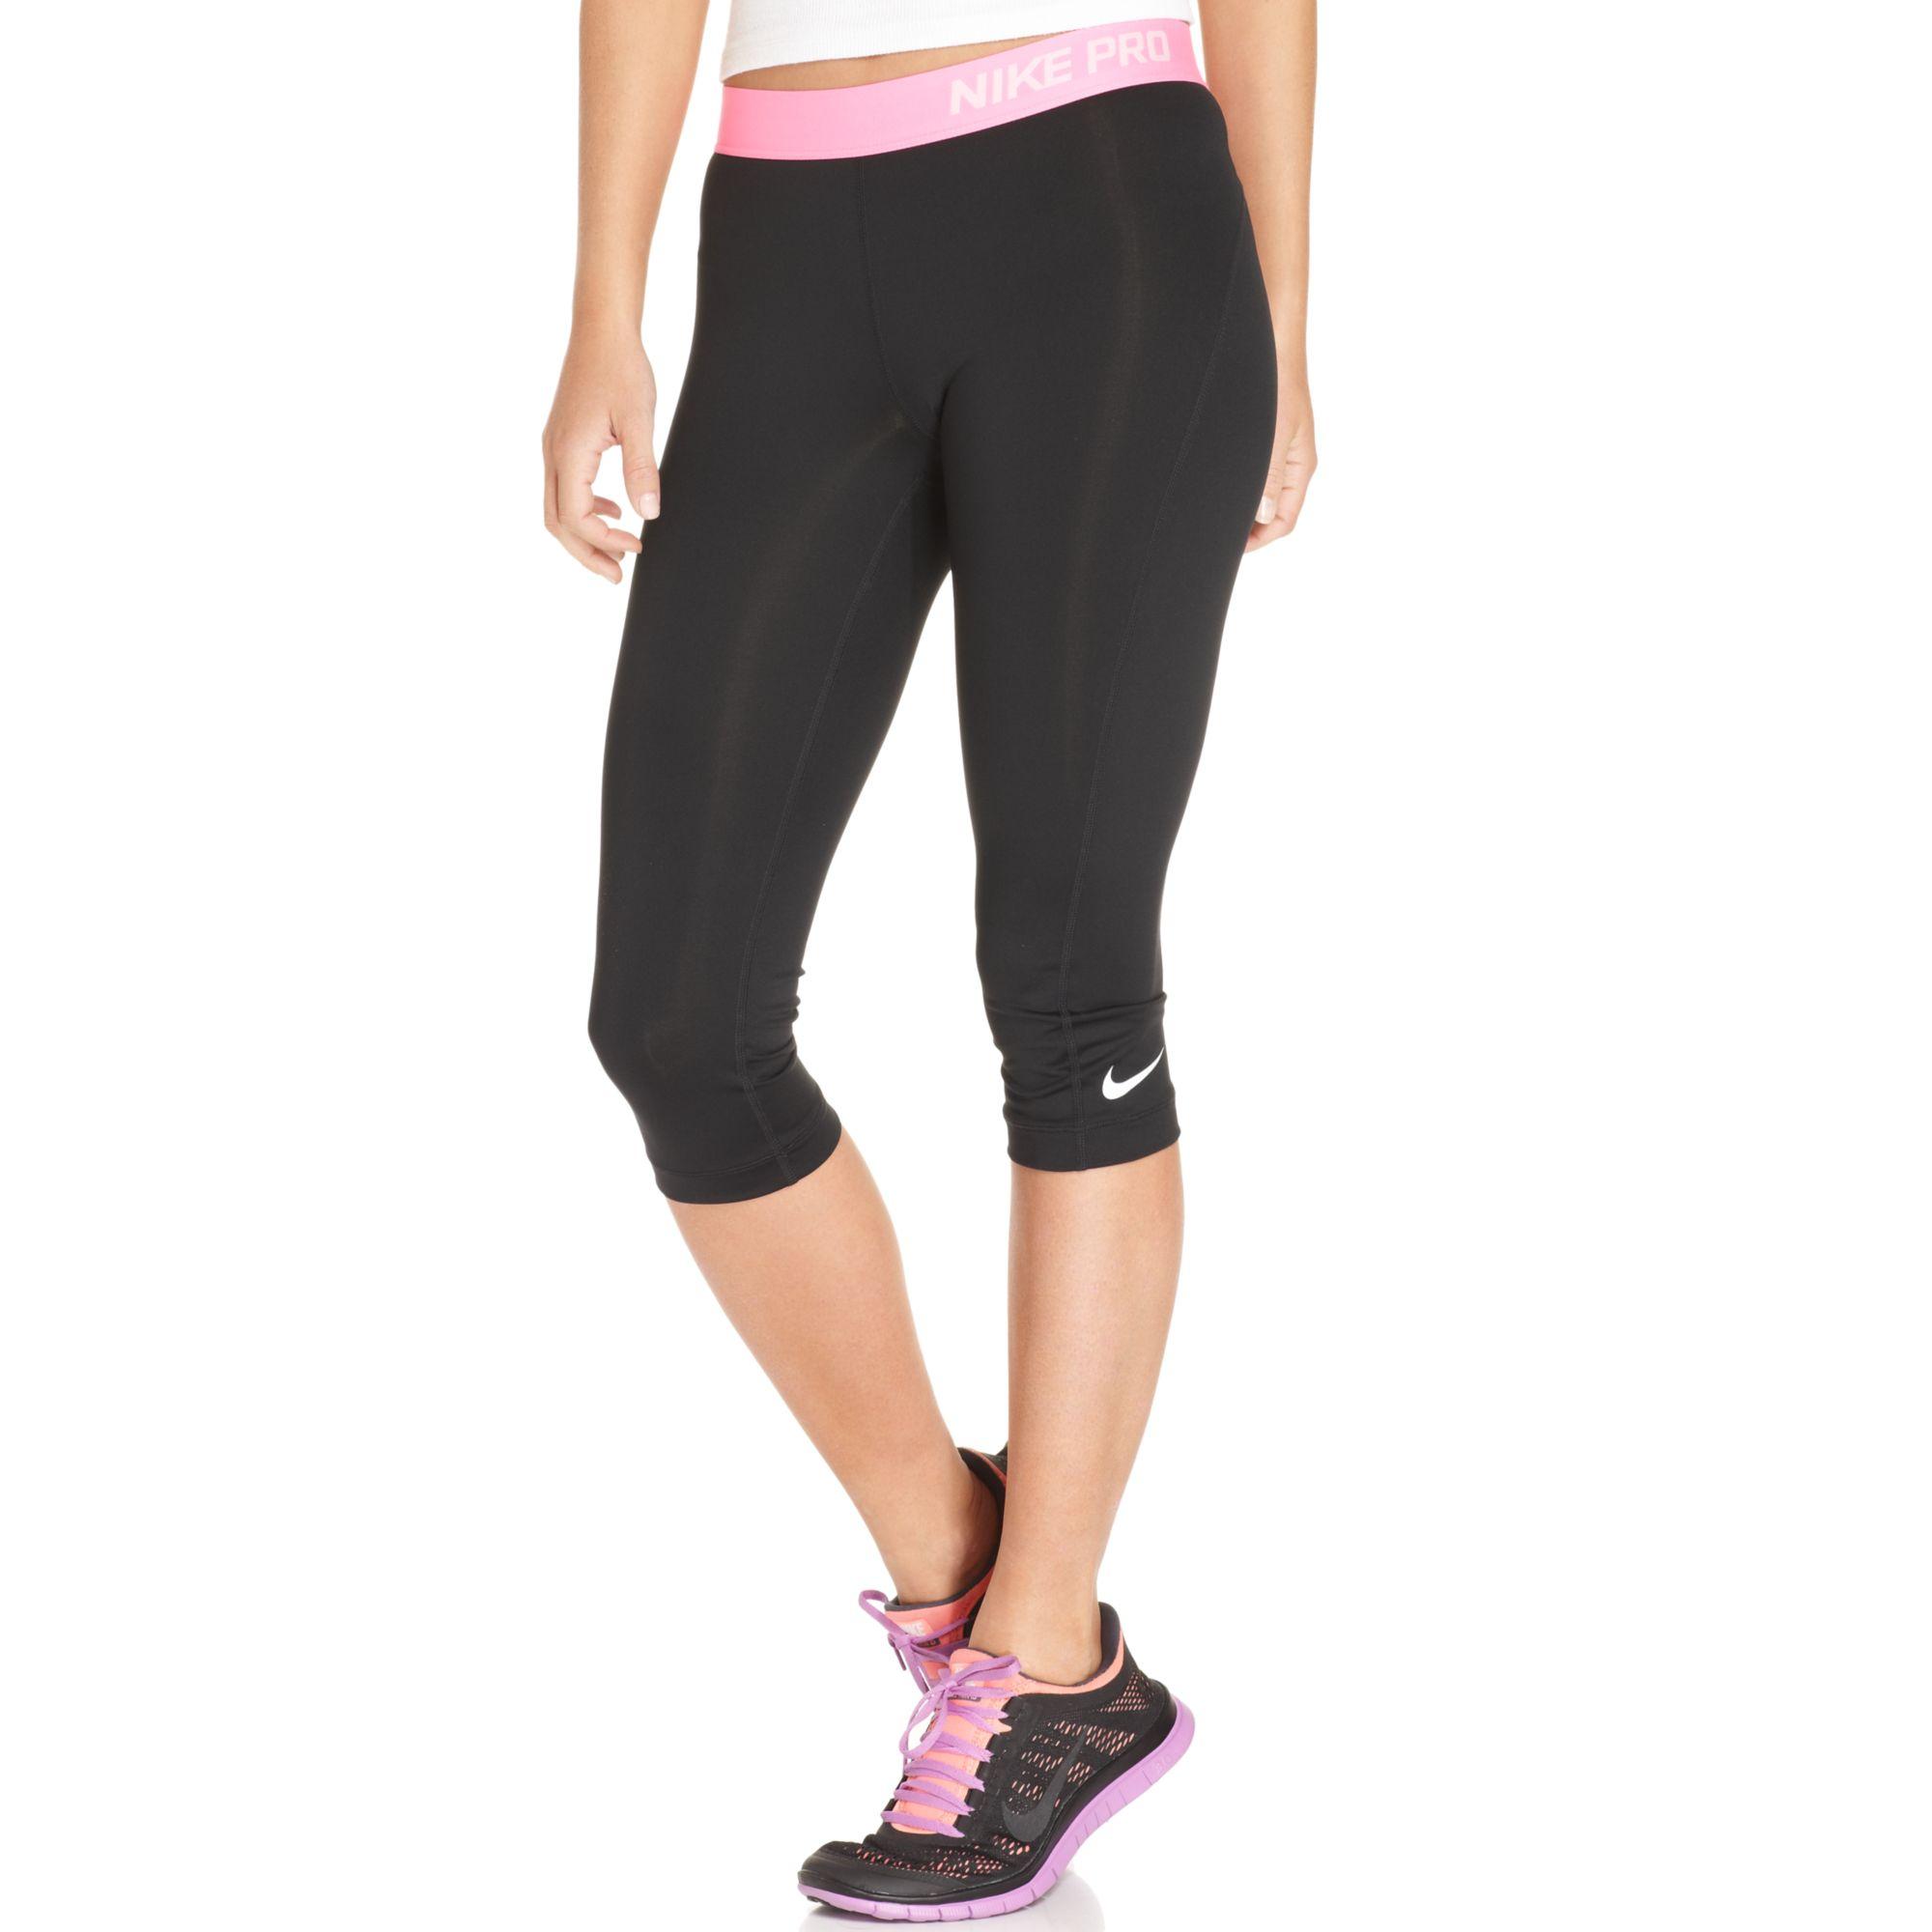 nike pro capri active leggings in pink black pink glow. Black Bedroom Furniture Sets. Home Design Ideas